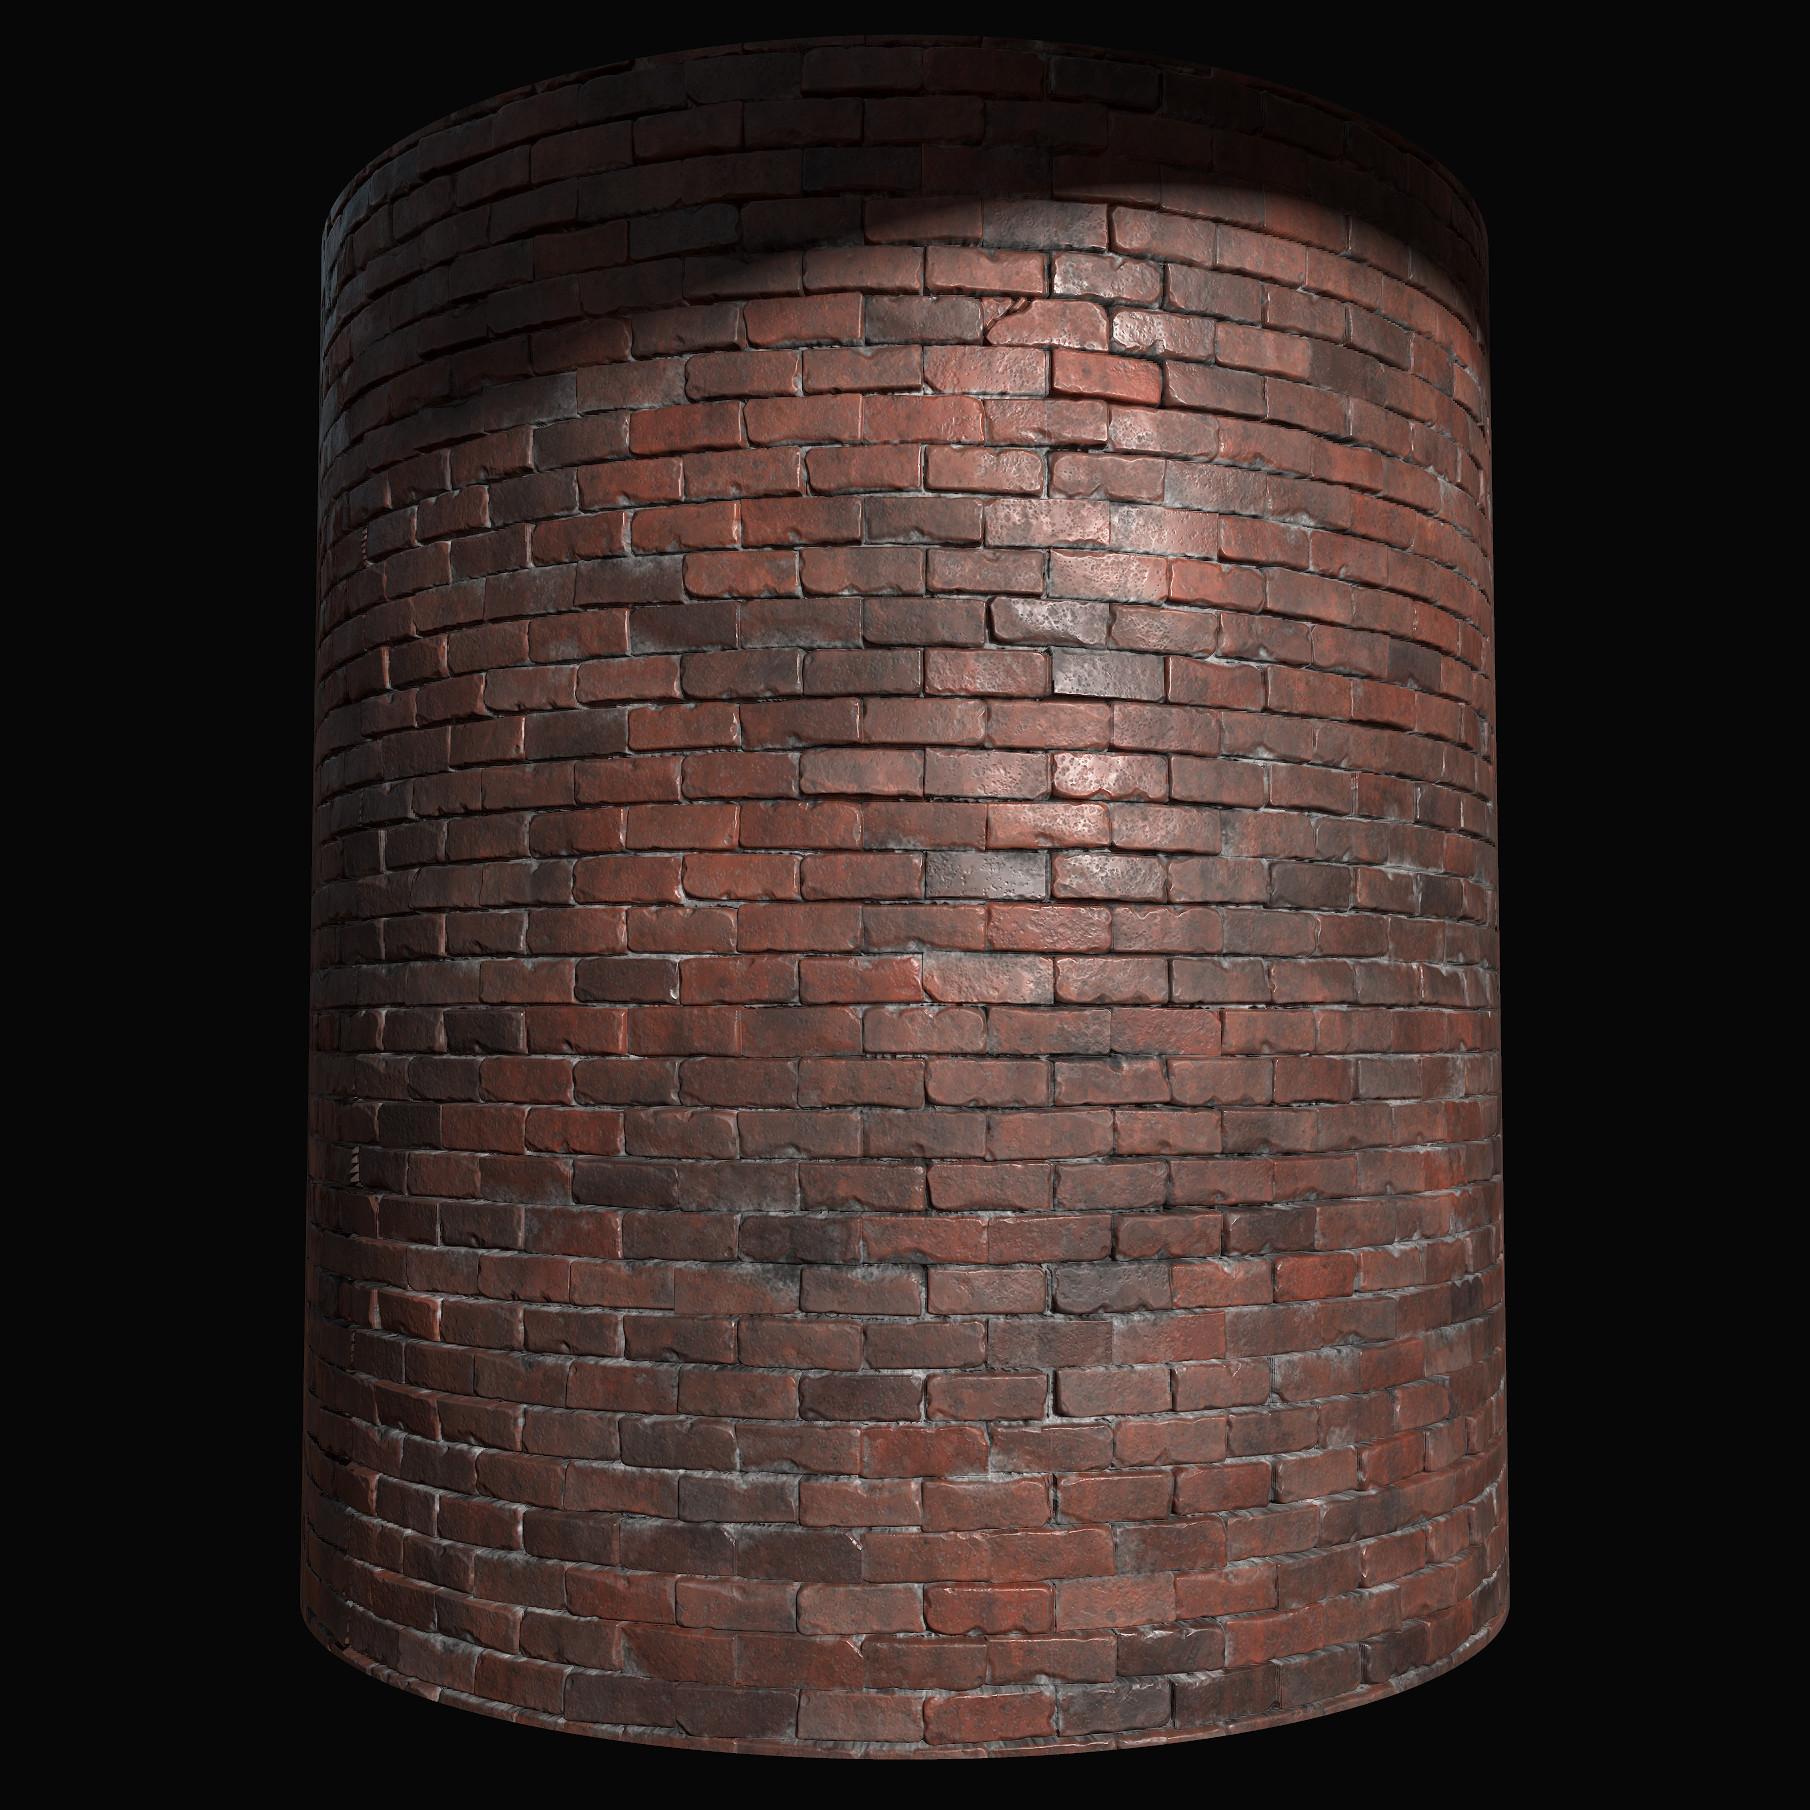 ArtStation - Bricks - ZBrush/Substance Designer, Marvin Lorenz